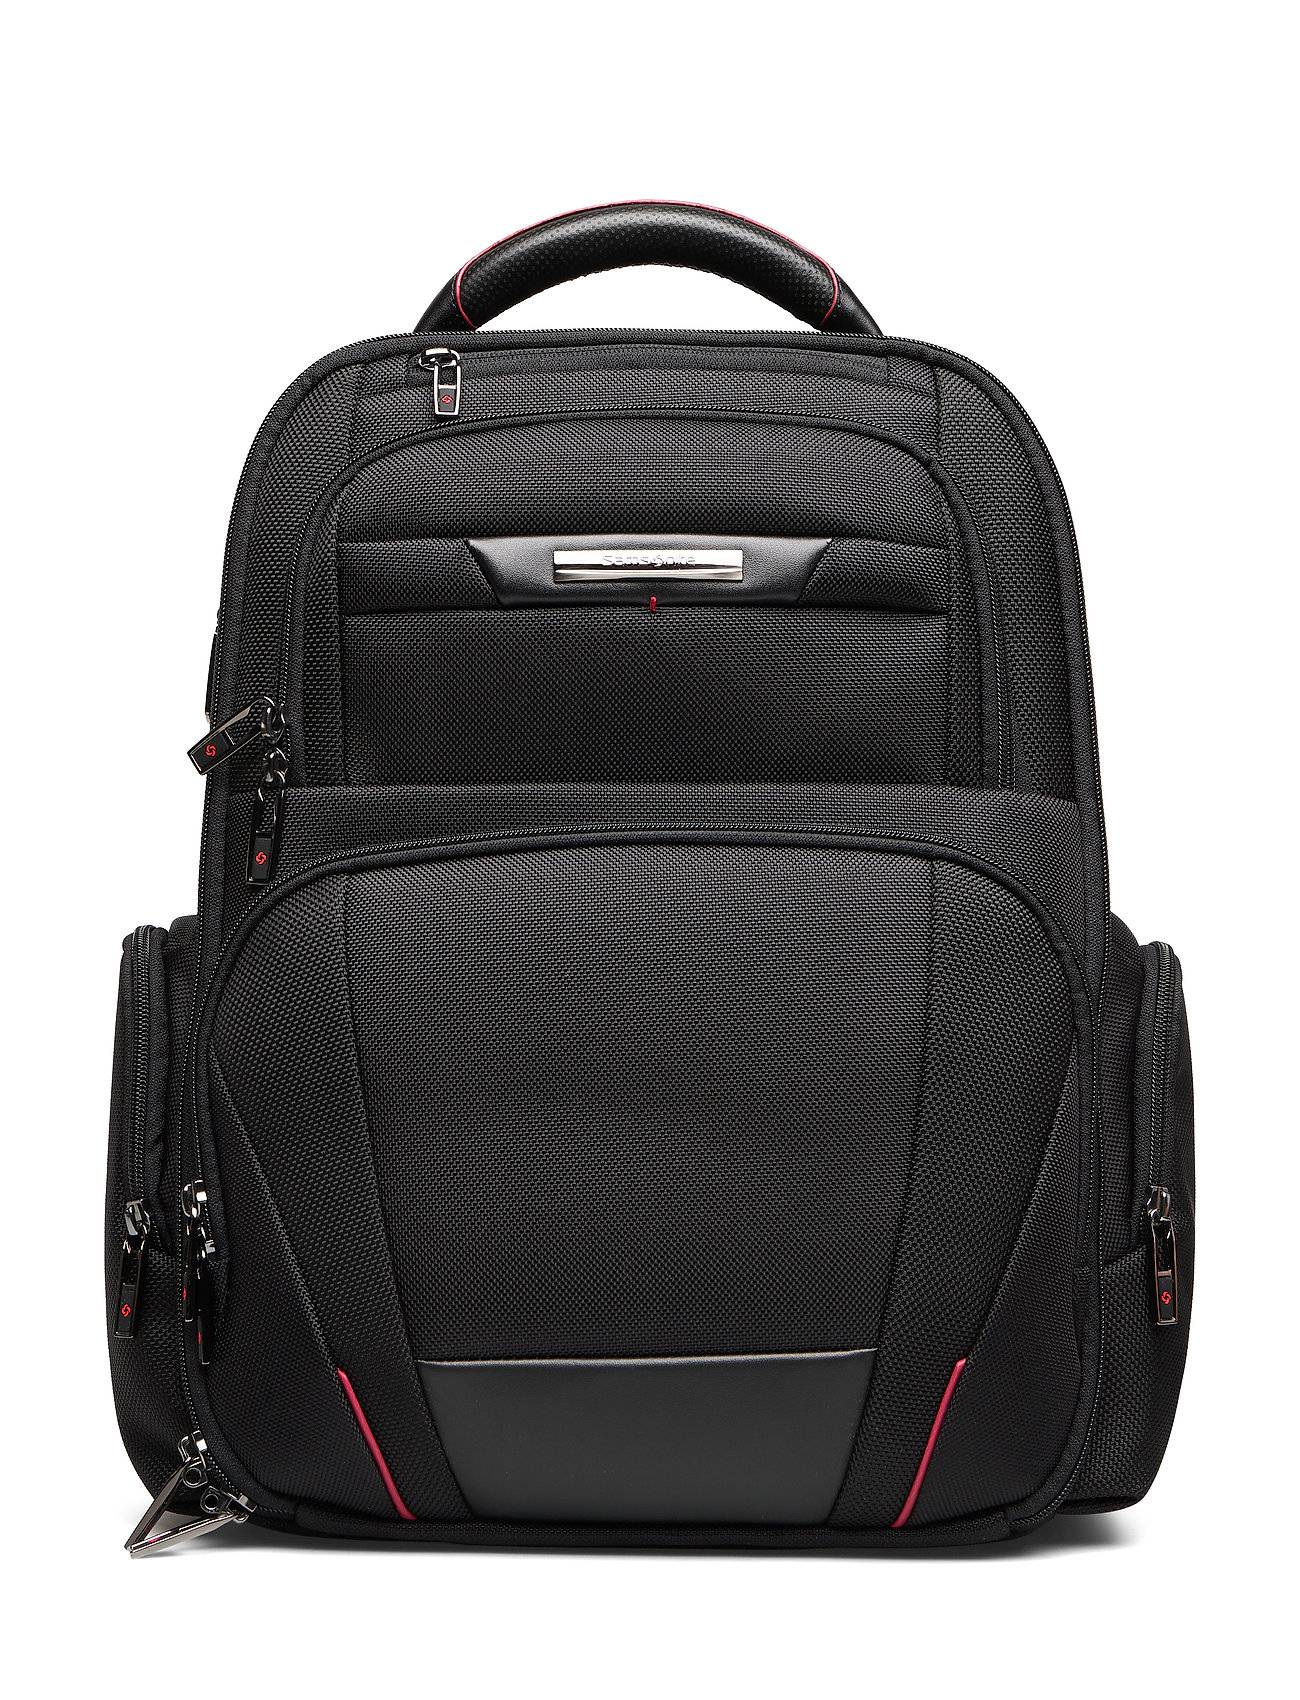 Samsonite Pro Dlx Laptop Backpack 3v 15,6 Reppu Laukku Musta